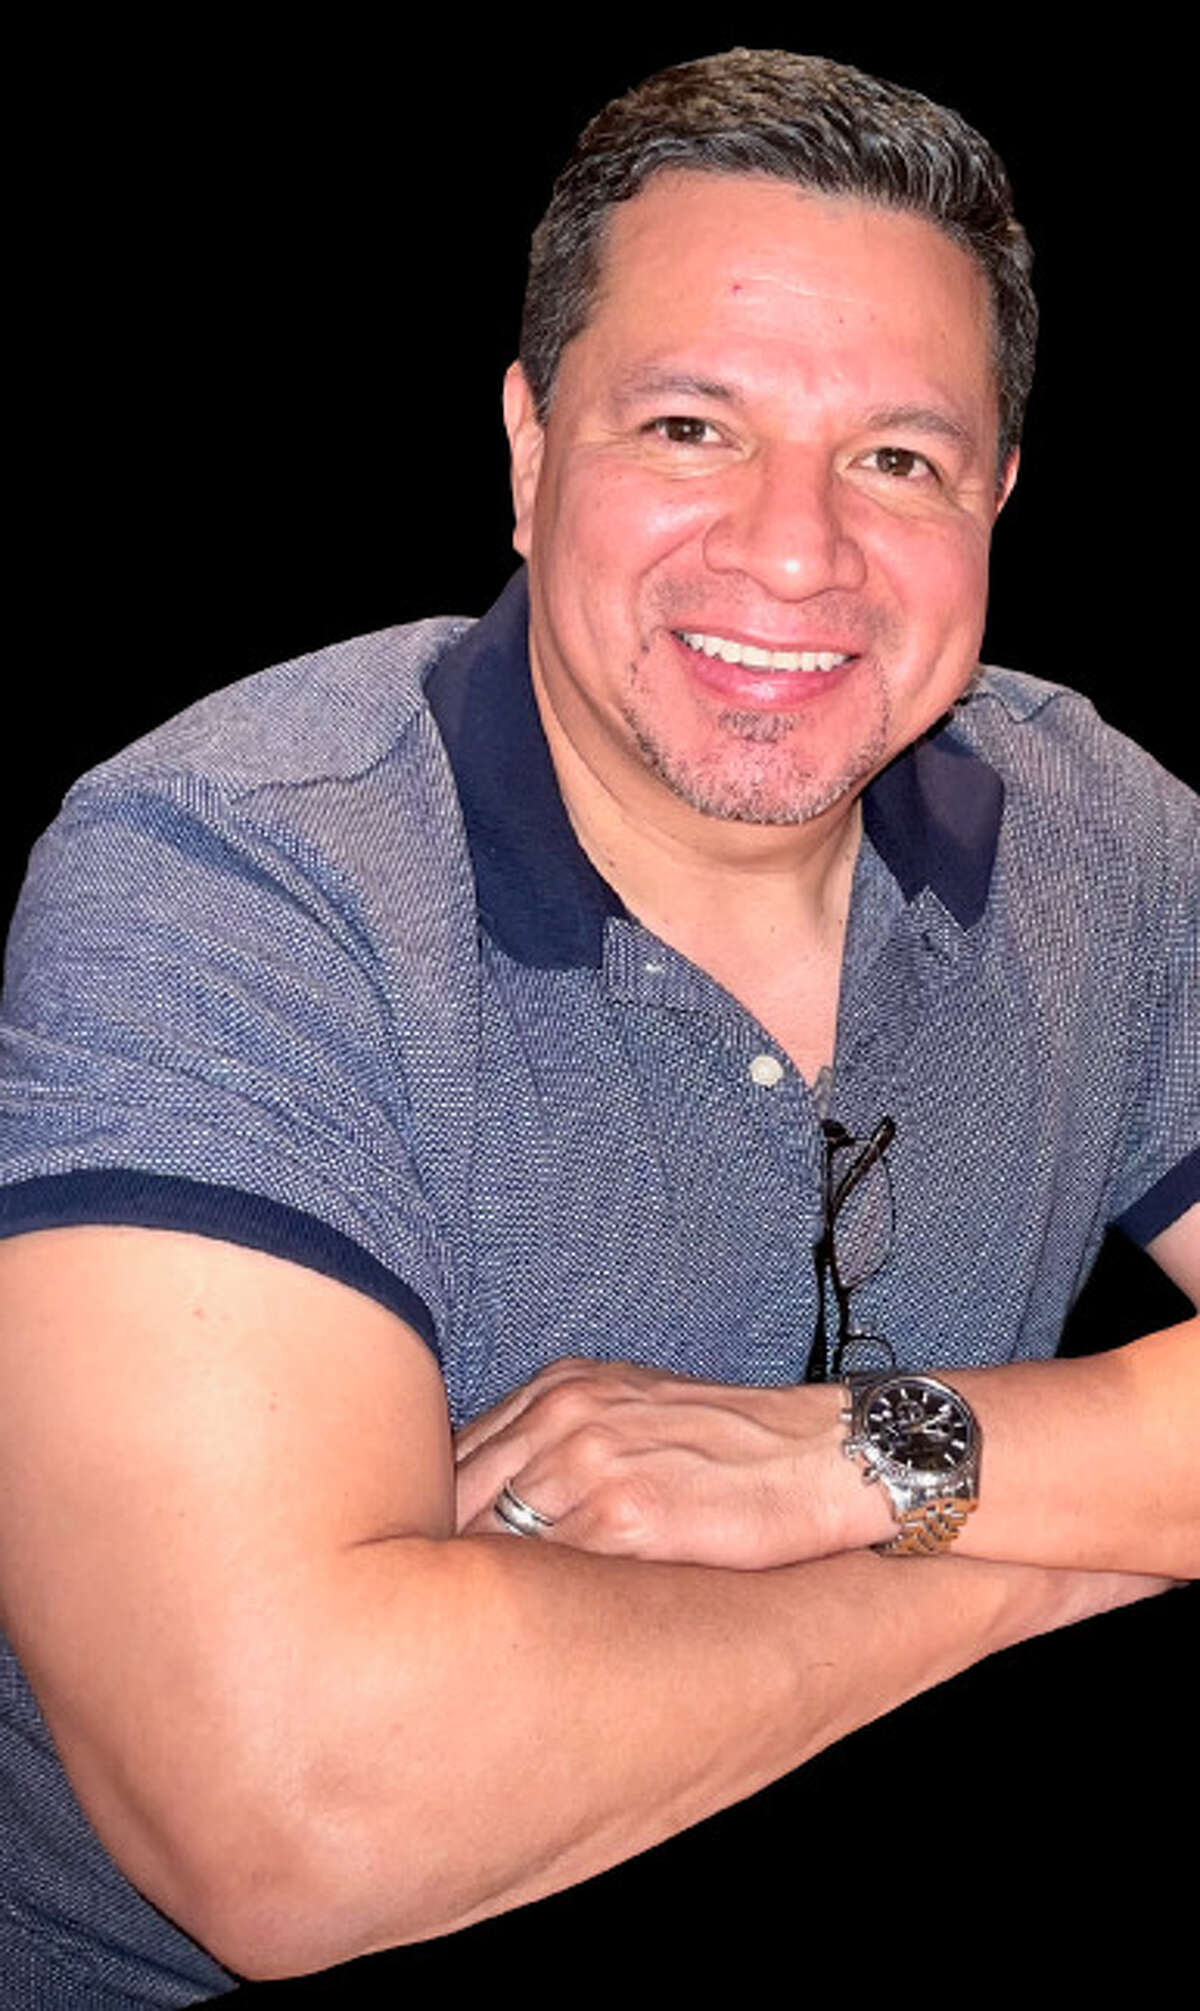 Joe Campos